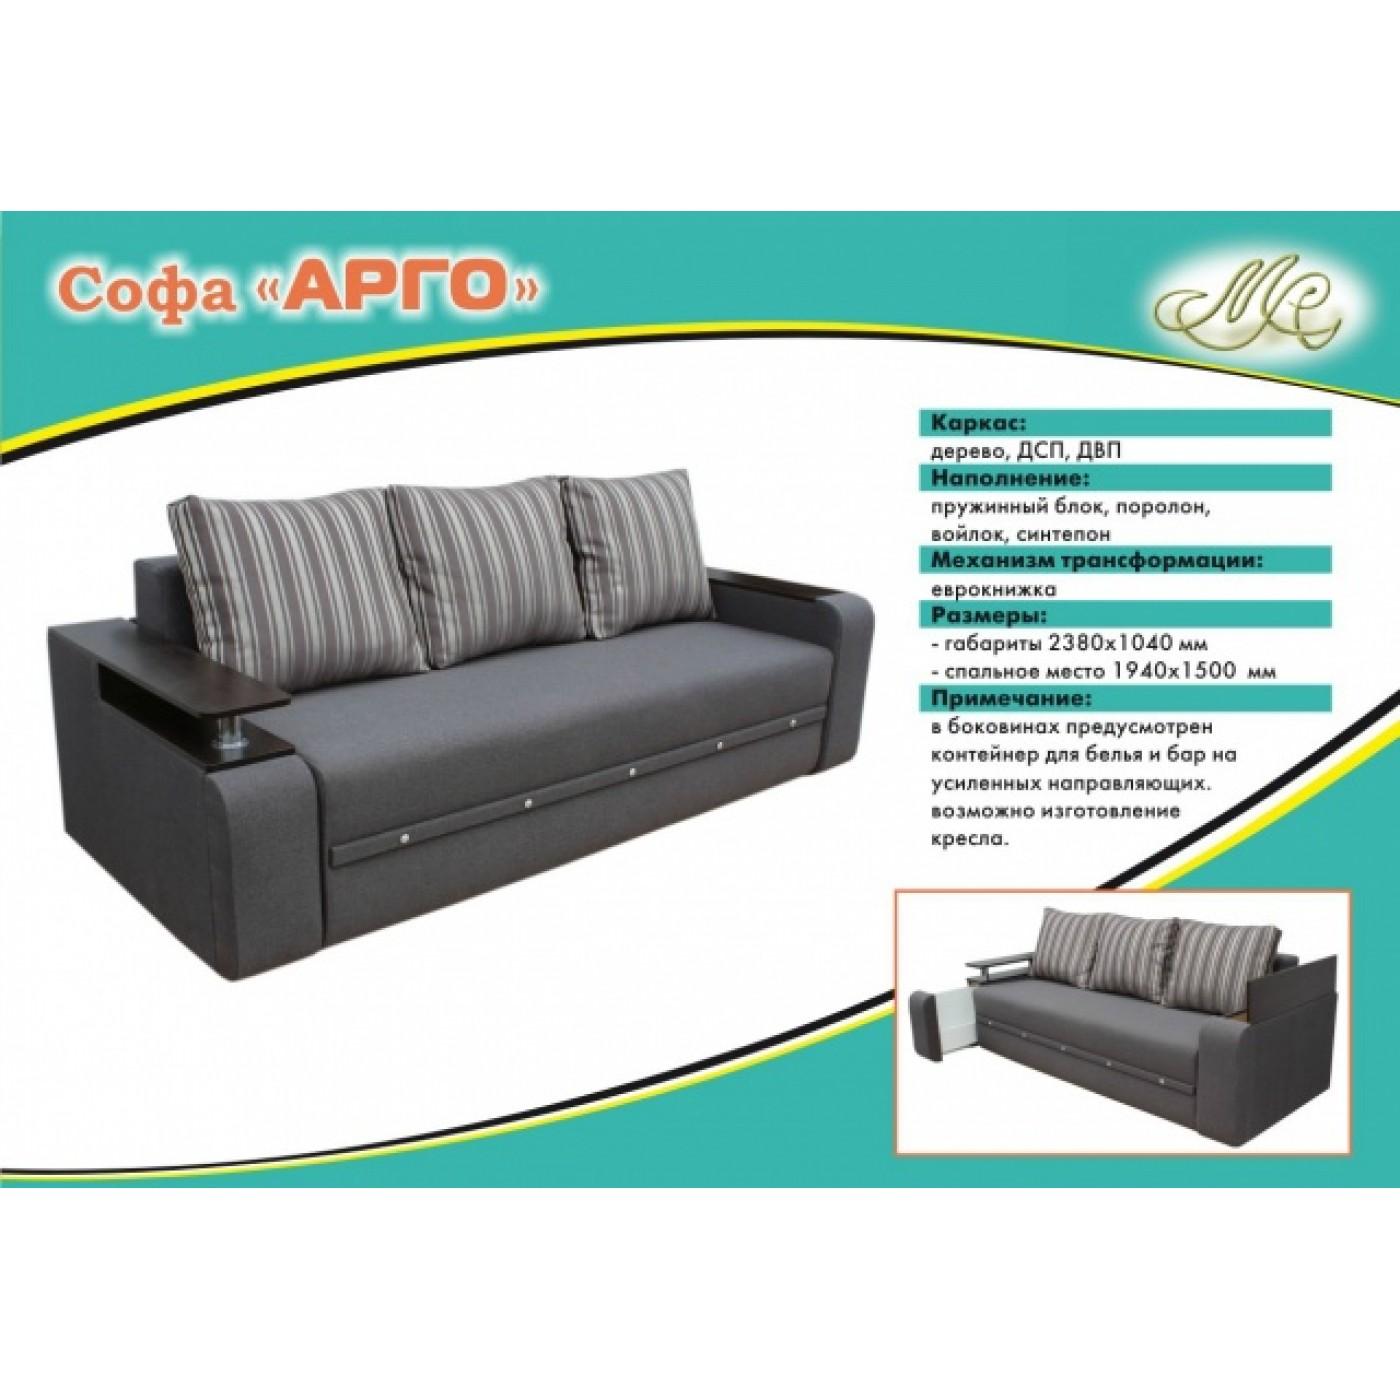 Арго софа